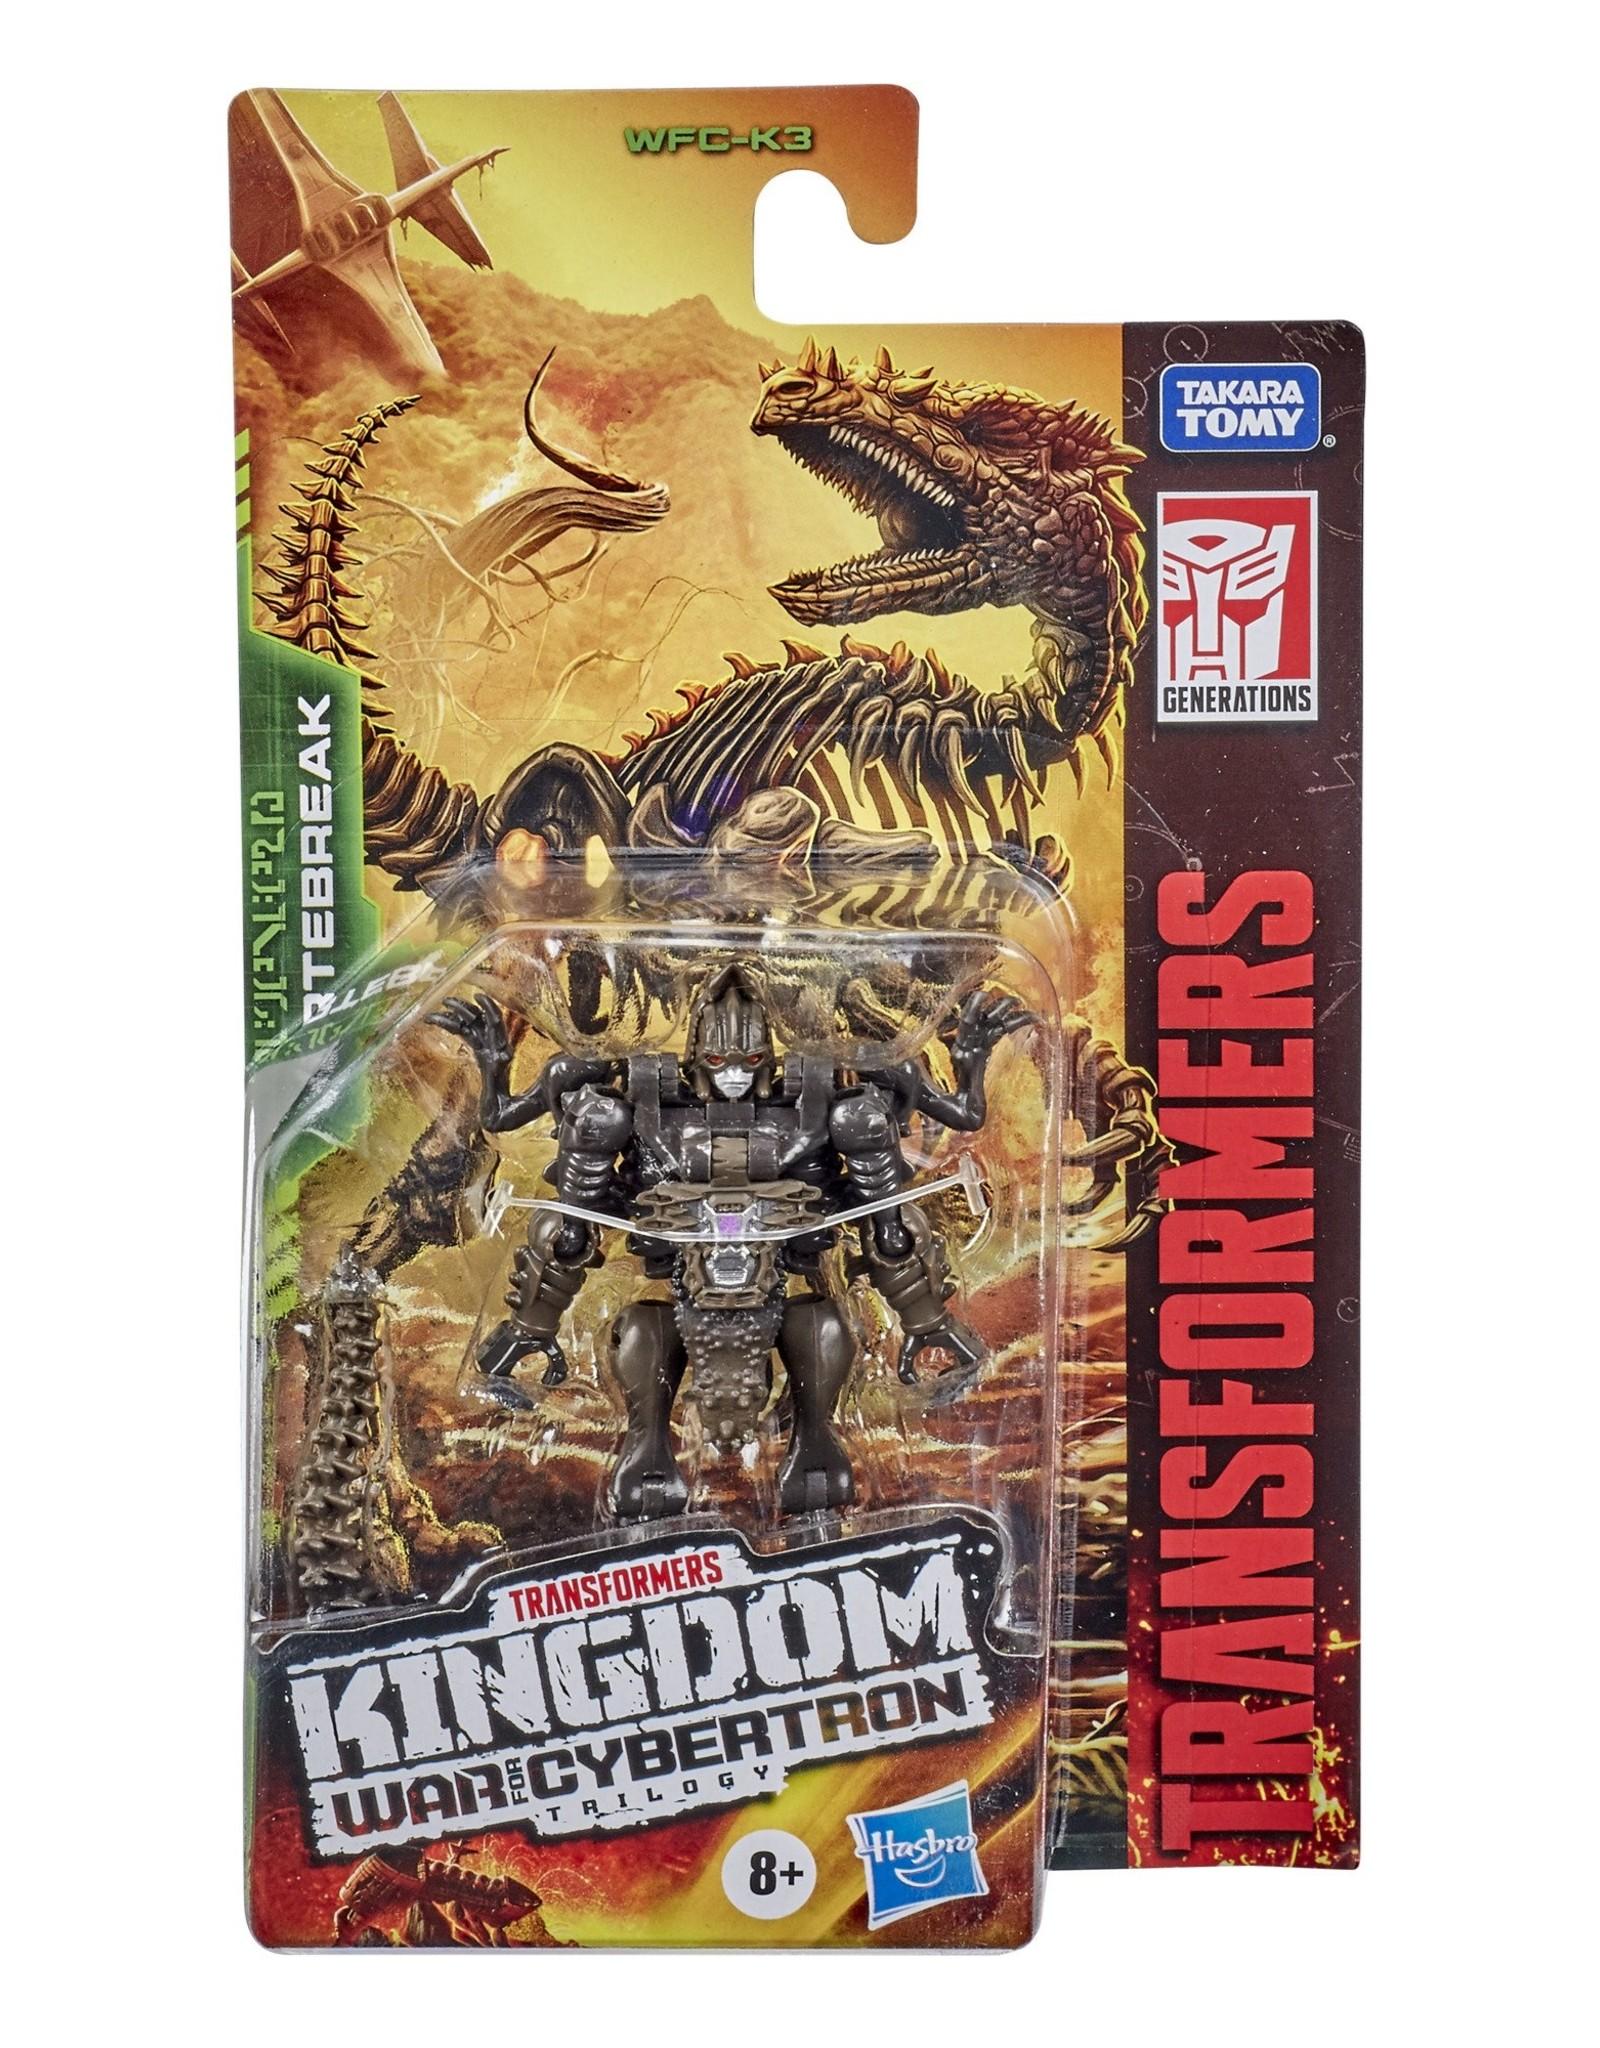 HASBRO Transformers Generations War for Cybertron: Kingdom Core Class WFC-K3 Vertebreak